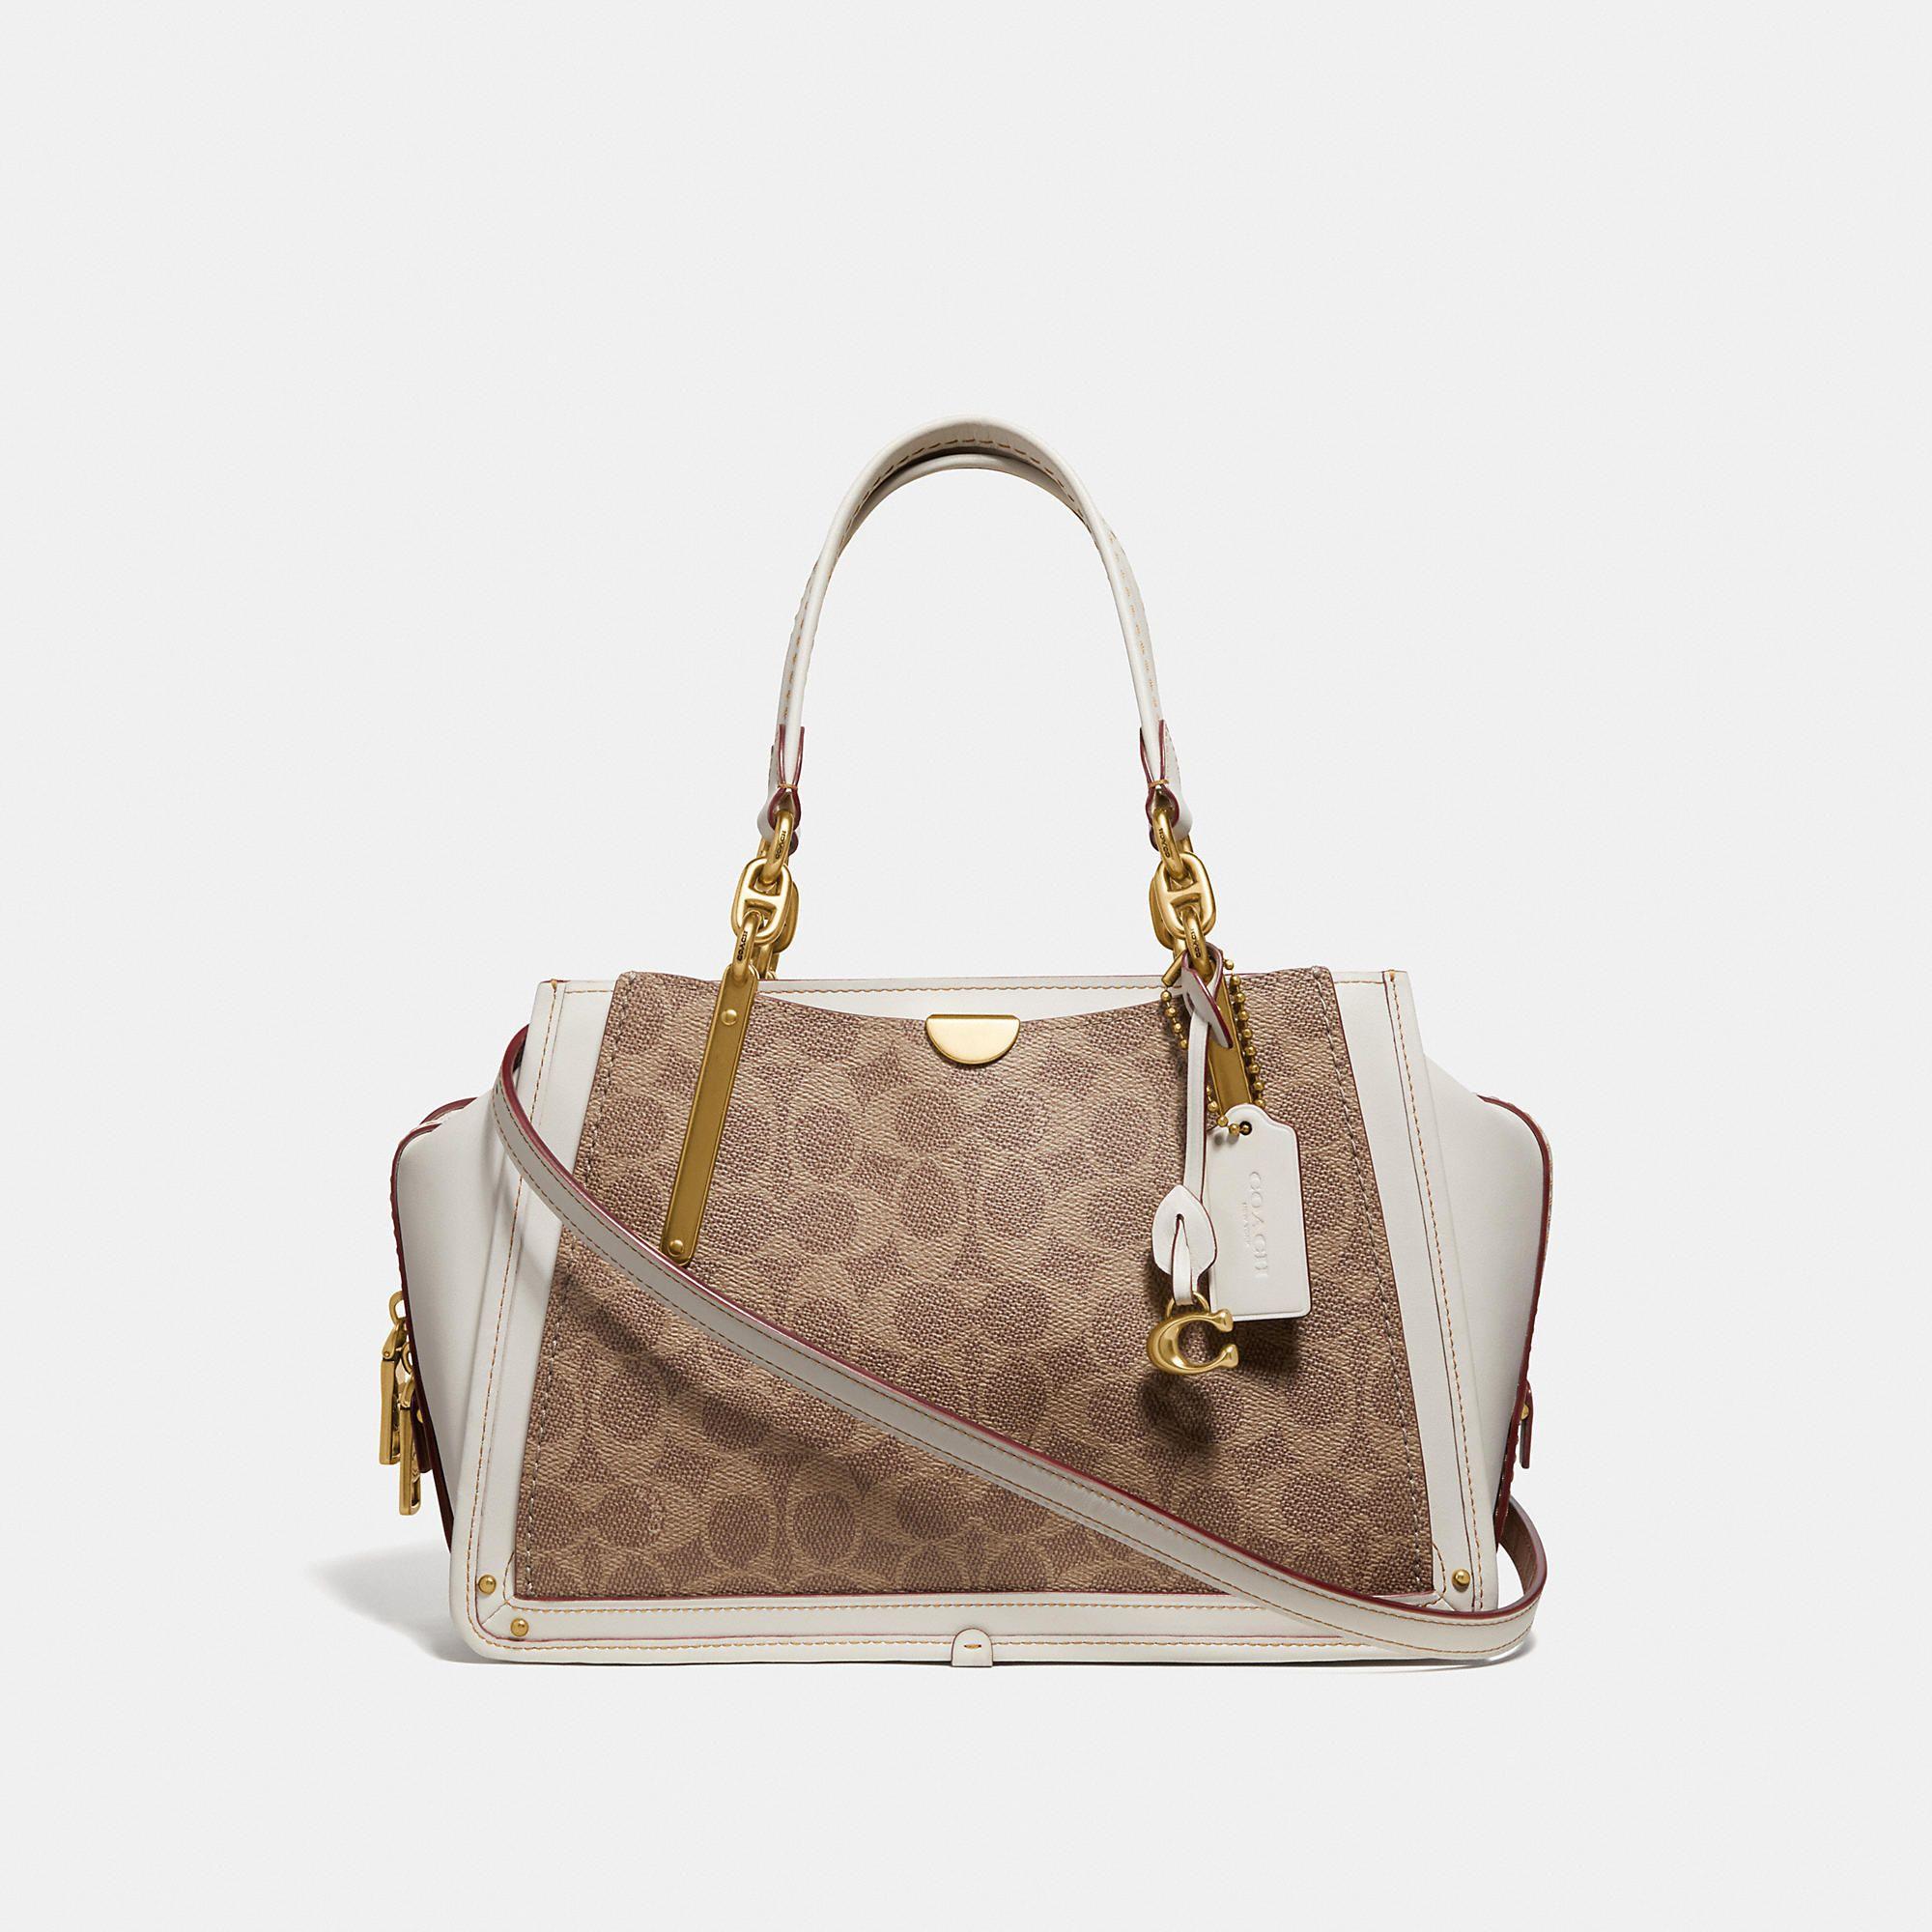 9bd2edef COACH Dreamer In Signature Canvas - Women's Designer Handbags in ...